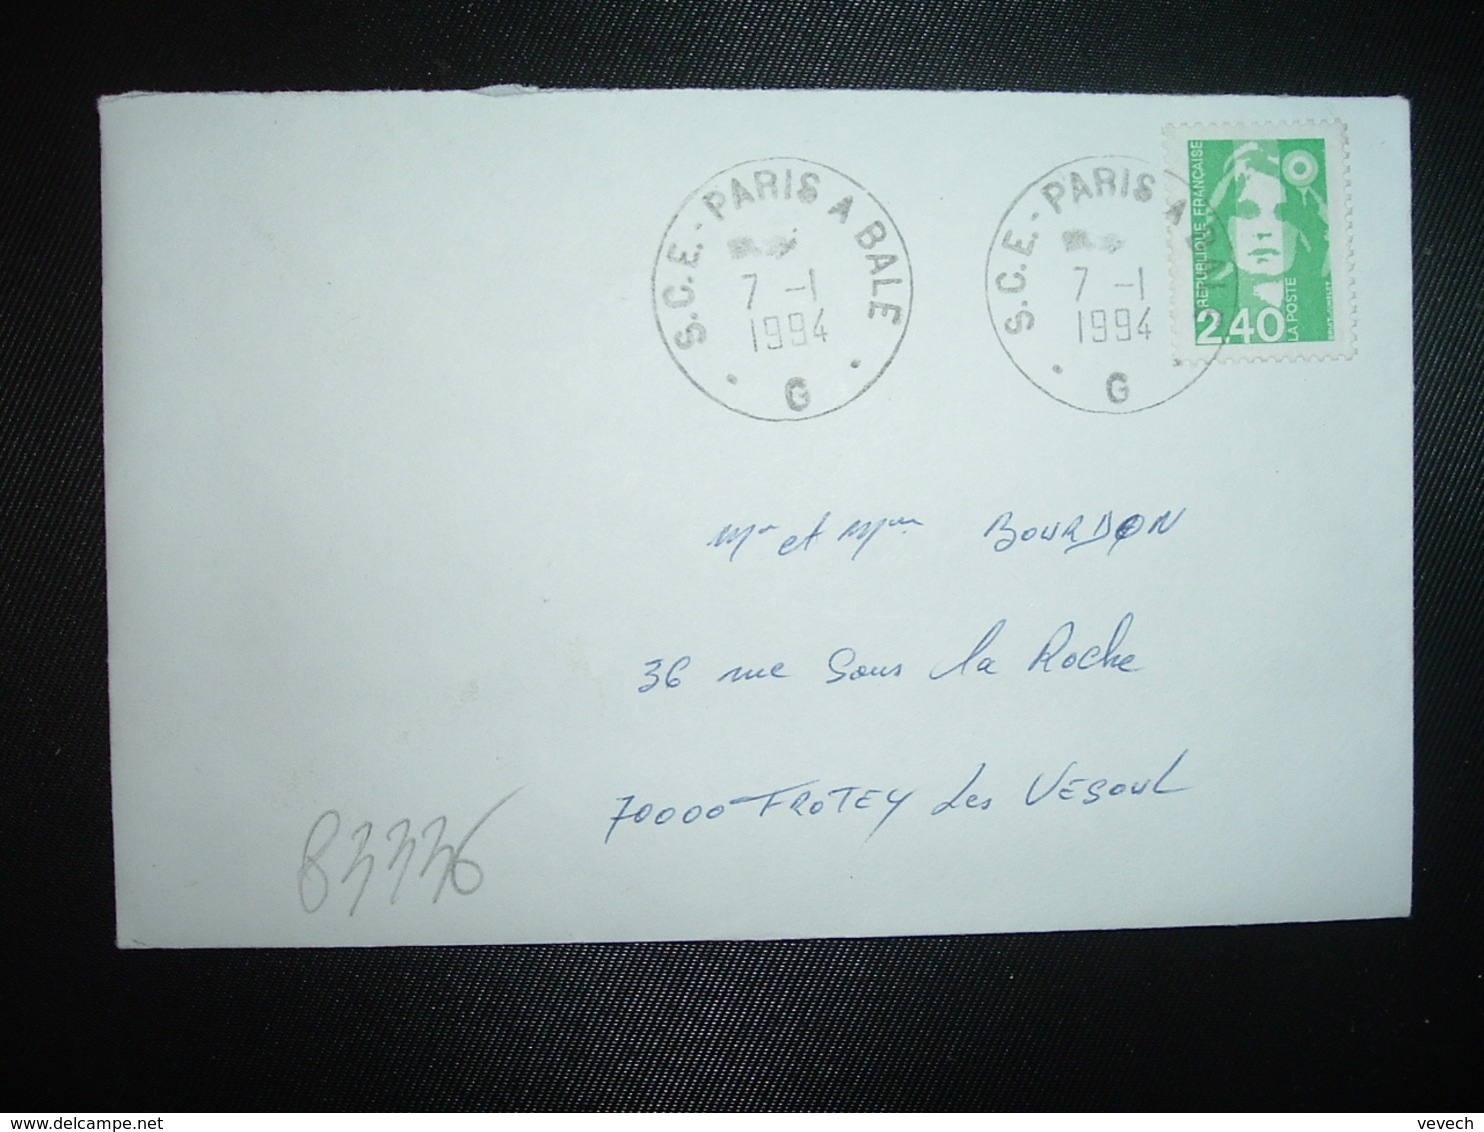 LETTRE TP M.DE BRIAT 2,40 OBL.7-1 1994 S.C.E. PARIS A BALE  G (AMBULANT) - 1997-04 Marianne Du 14 Juillet